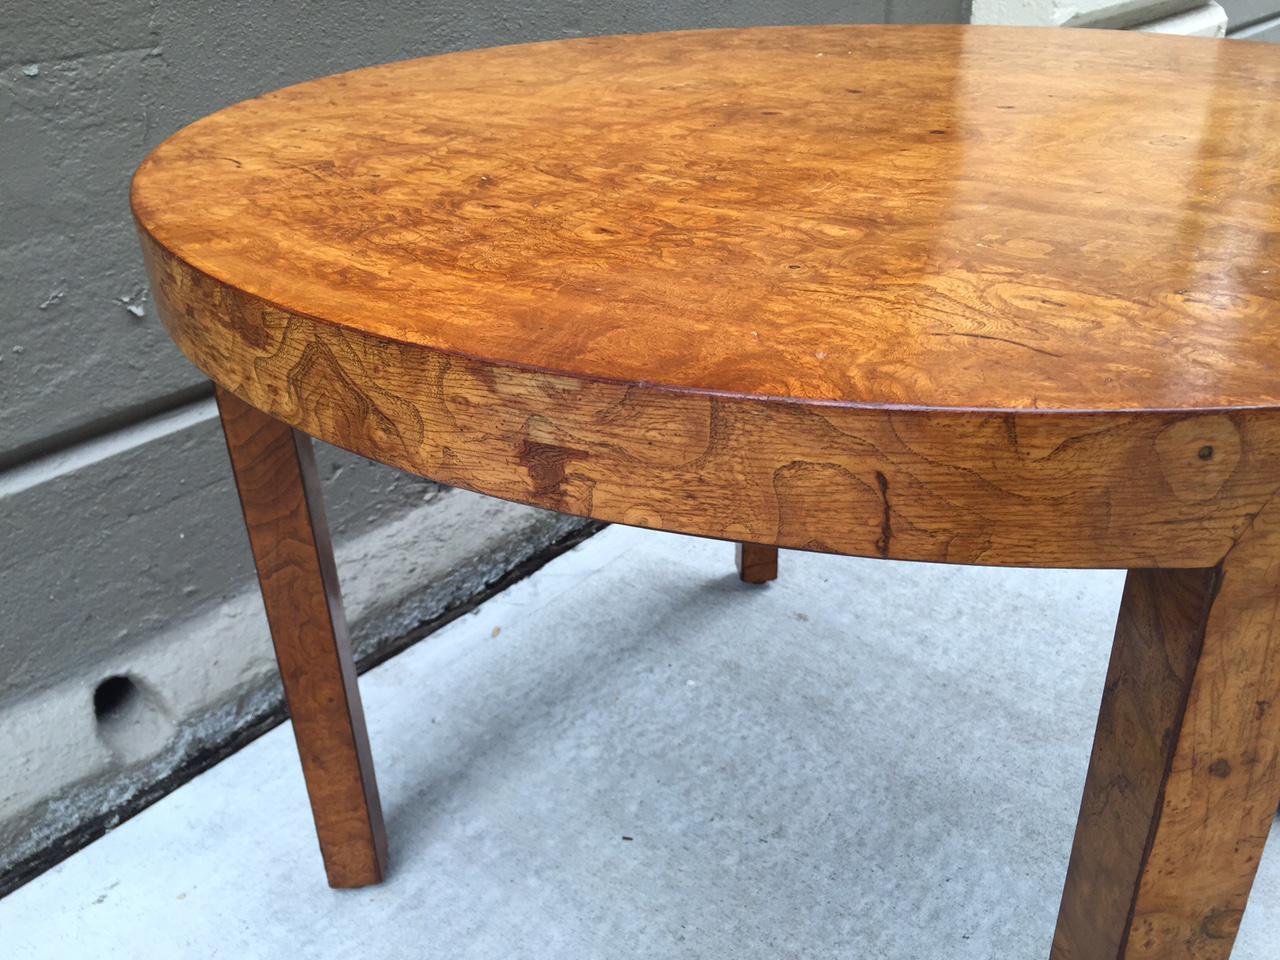 Ordinaire Art Deco Burl Wood Table   Image 5 Of 7